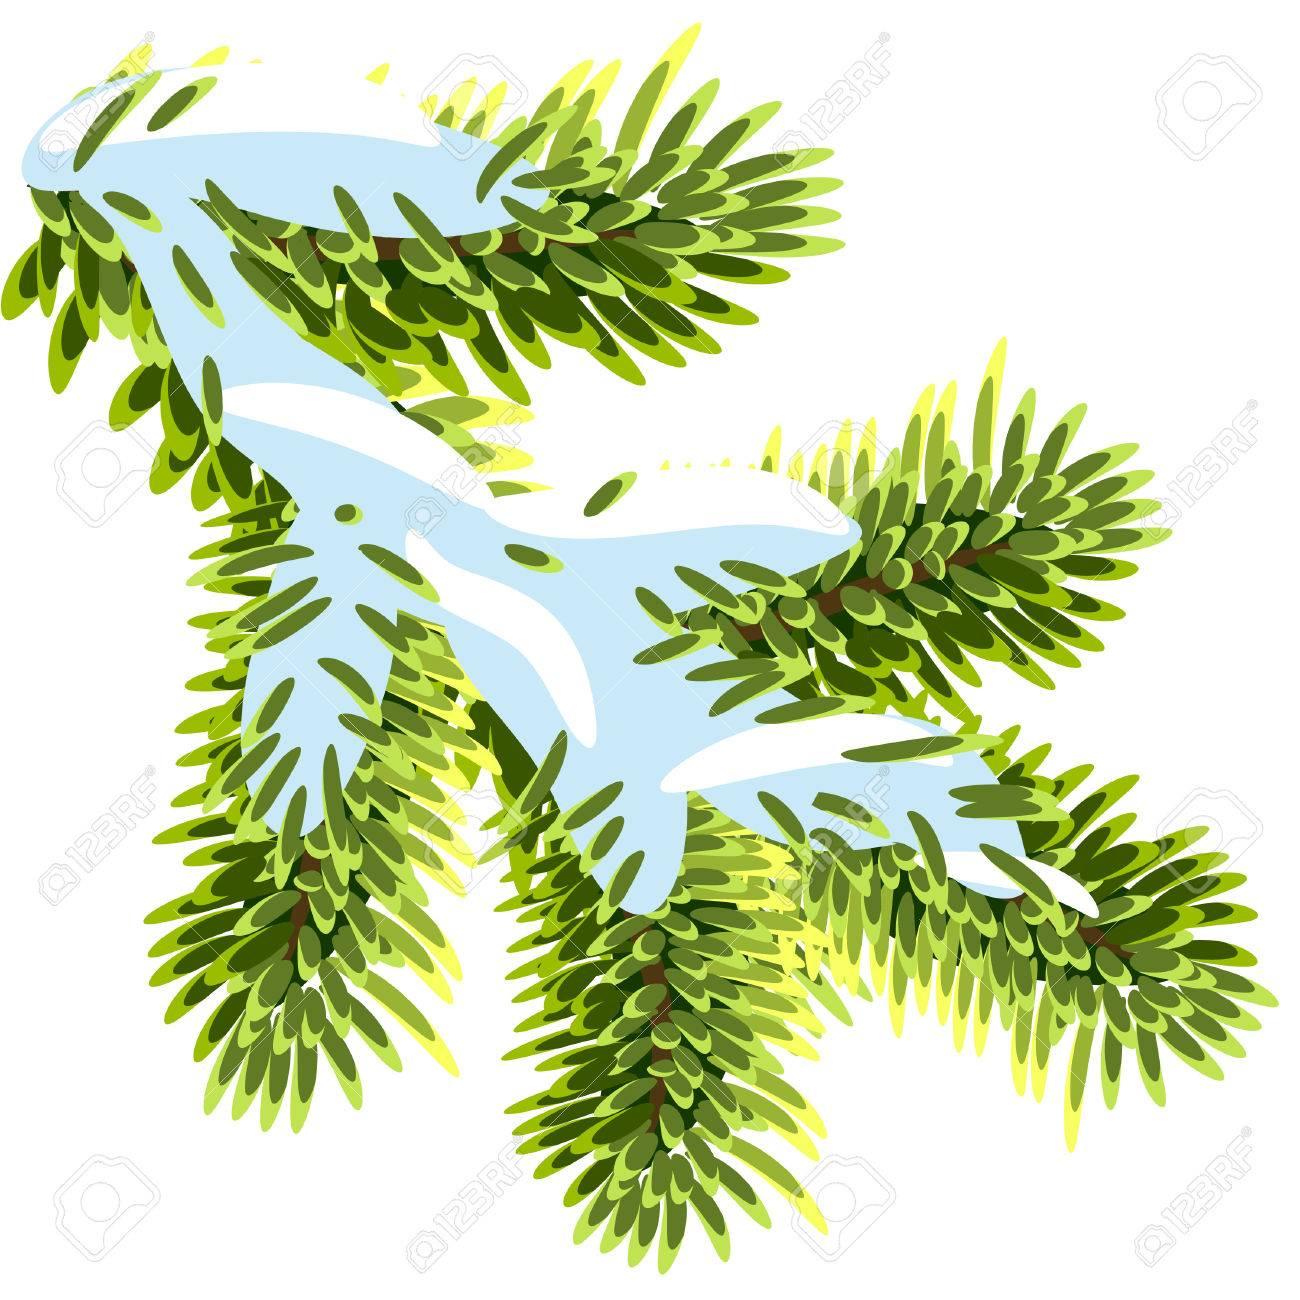 Fir branches under the snow Stock Vector - 8377320